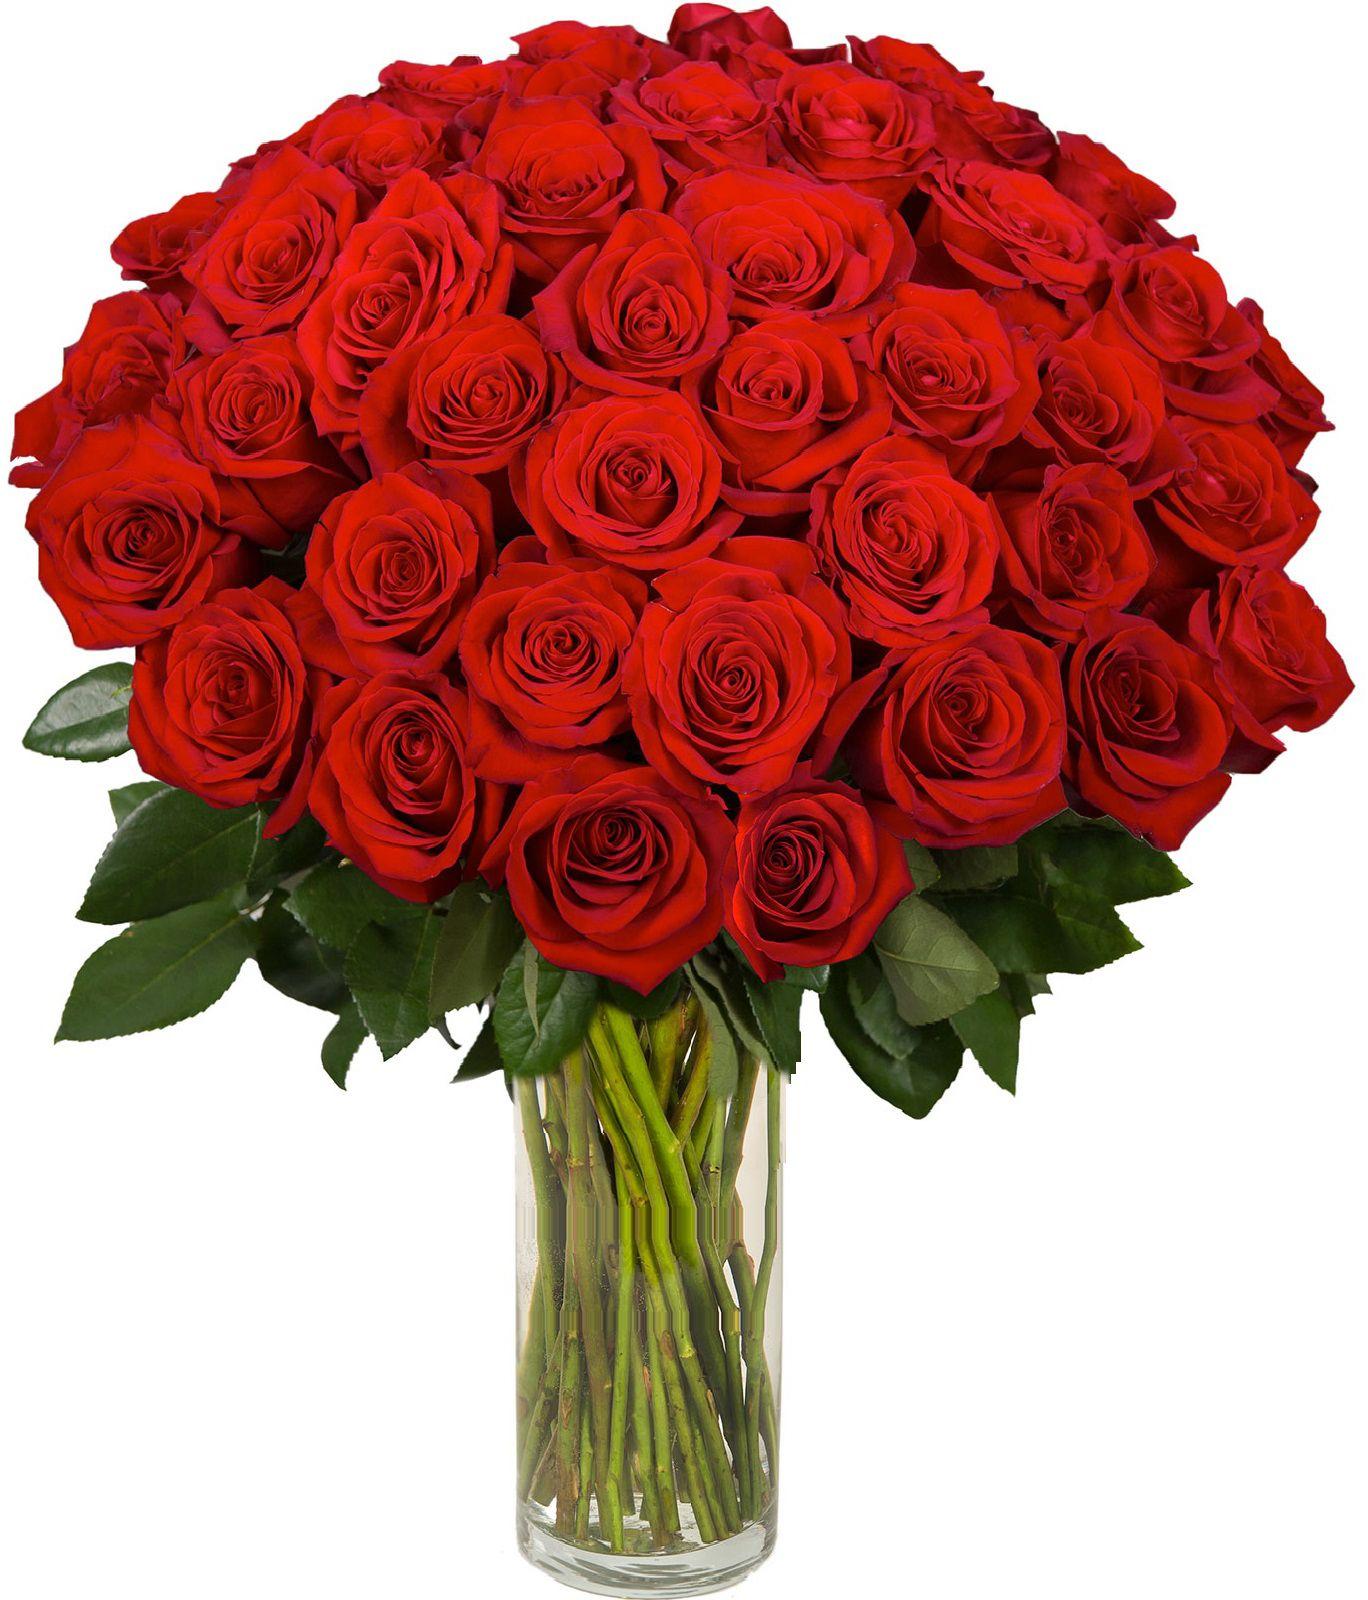 Разновидности и сорта цветка роза фото и описание